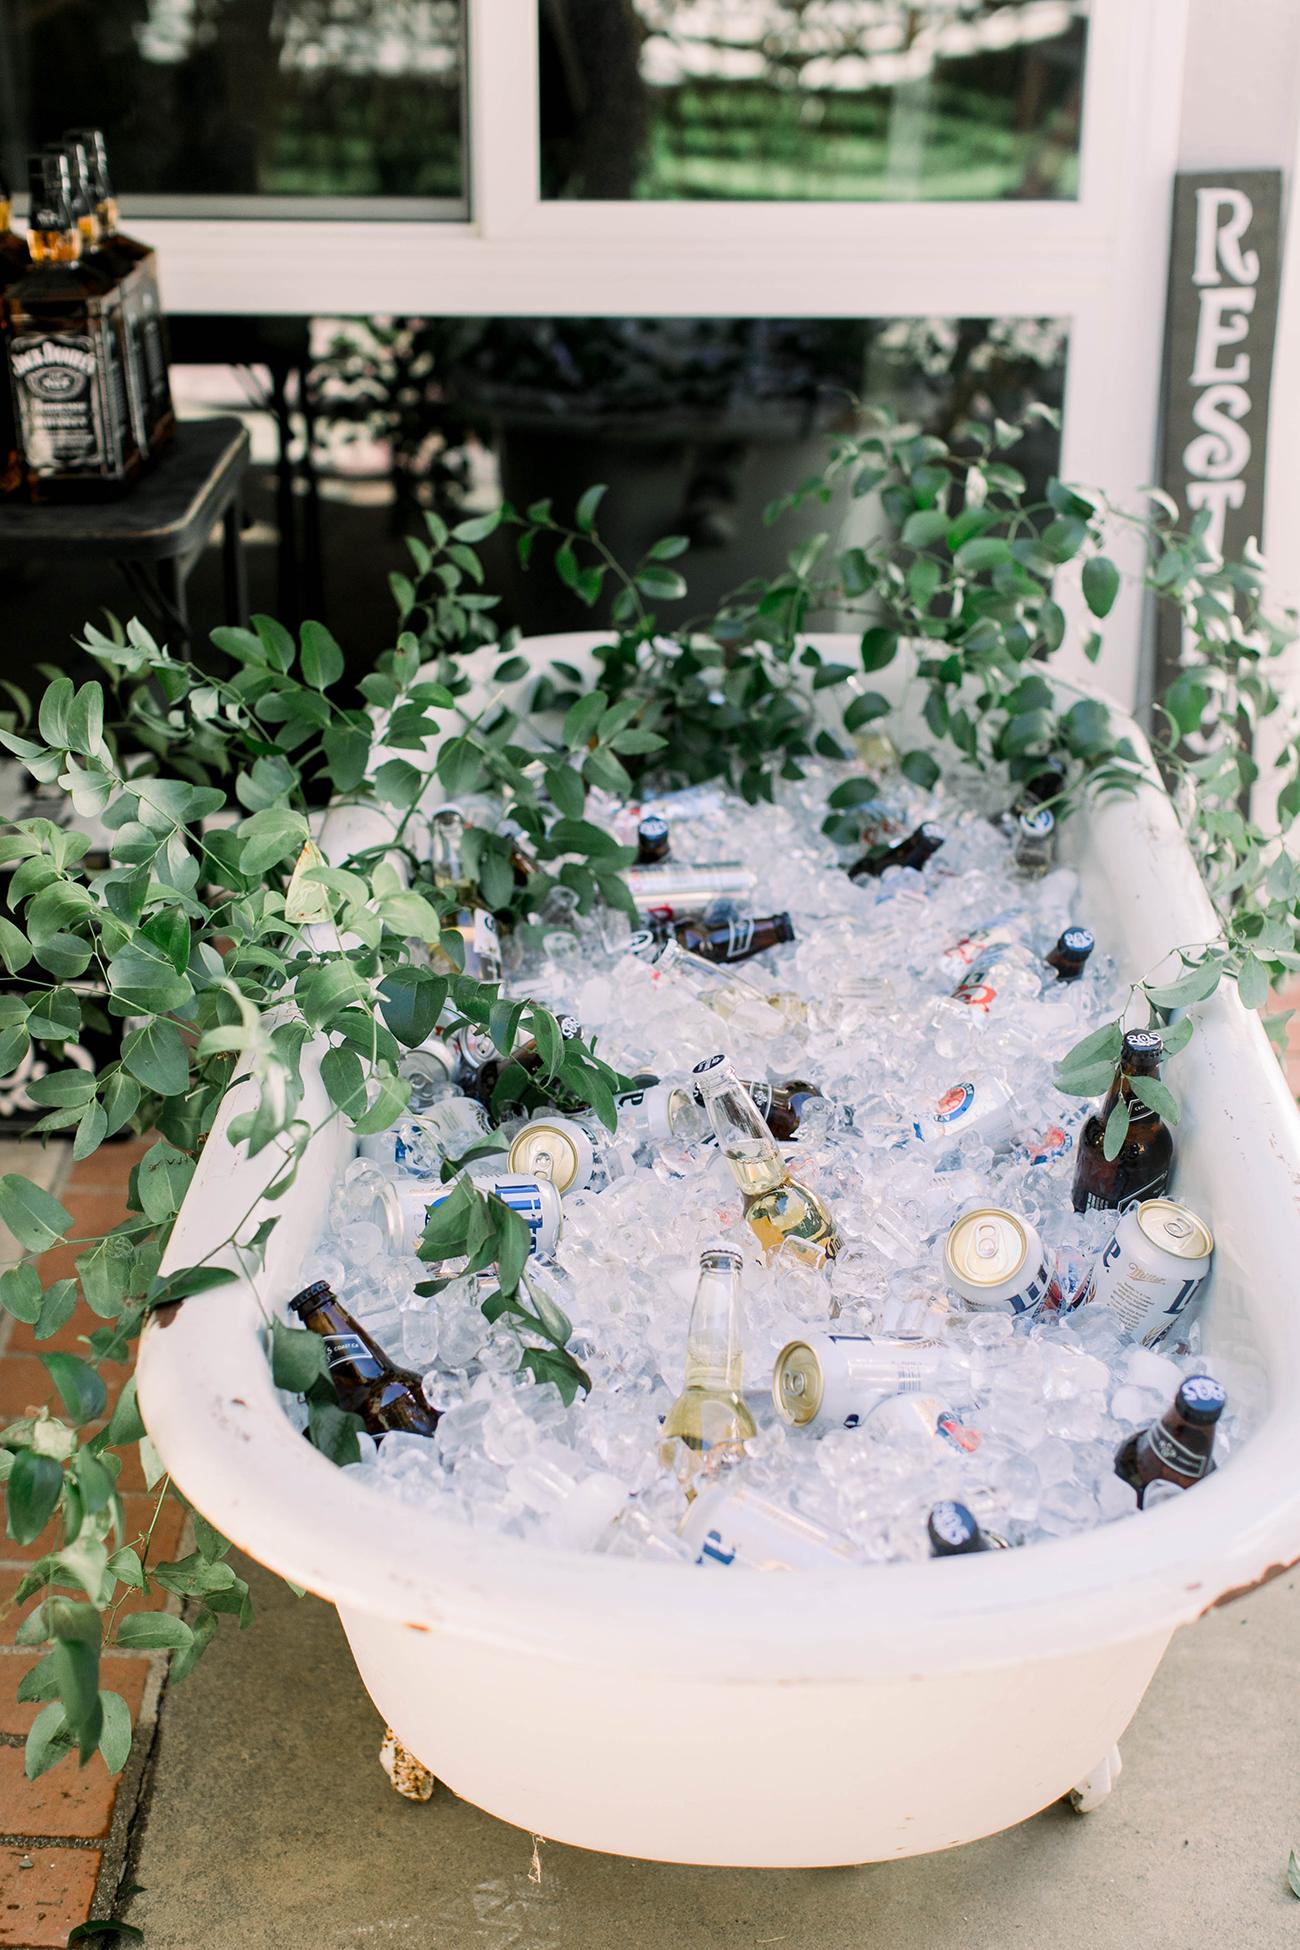 drinks served in old fashioned bath tub